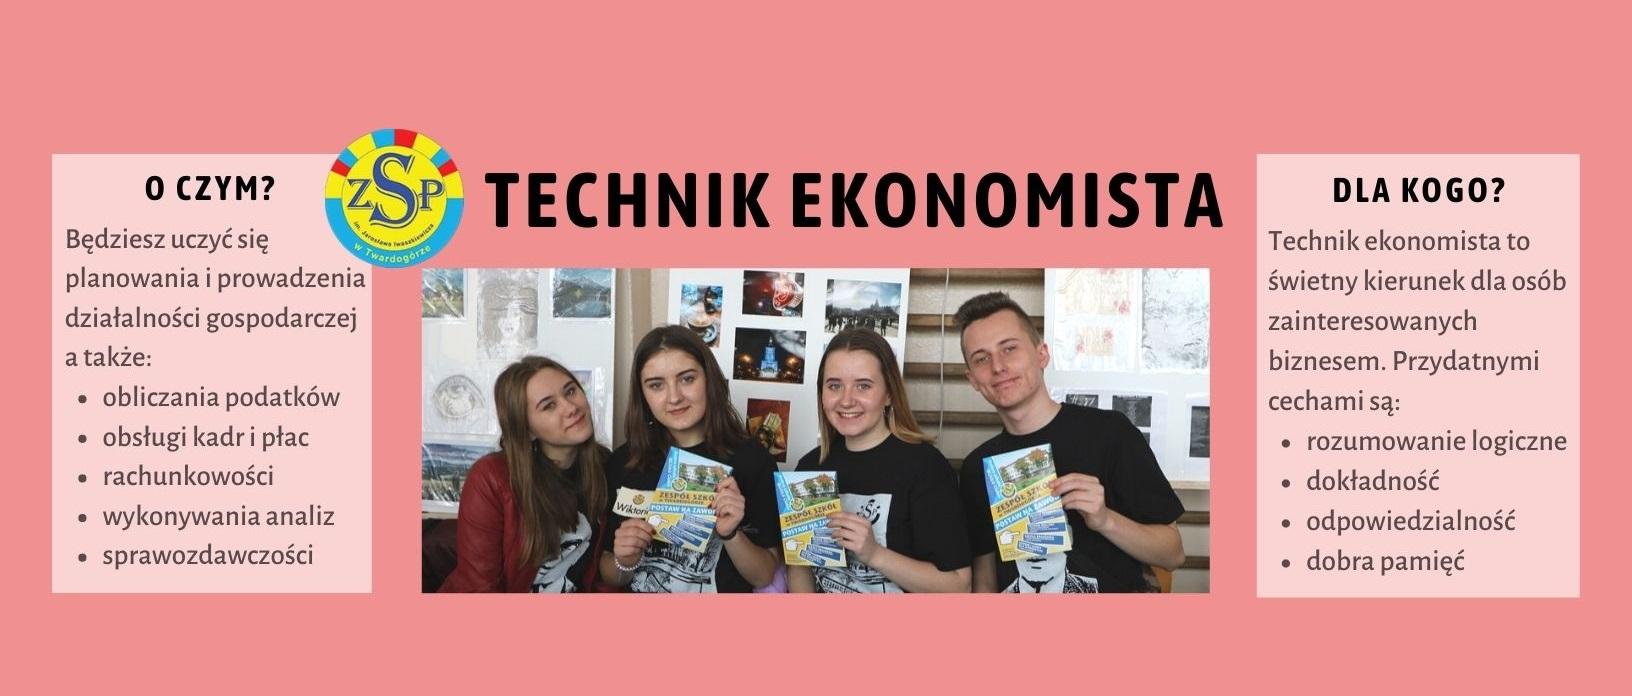 Technik ekonomista – rekrutacja 2021